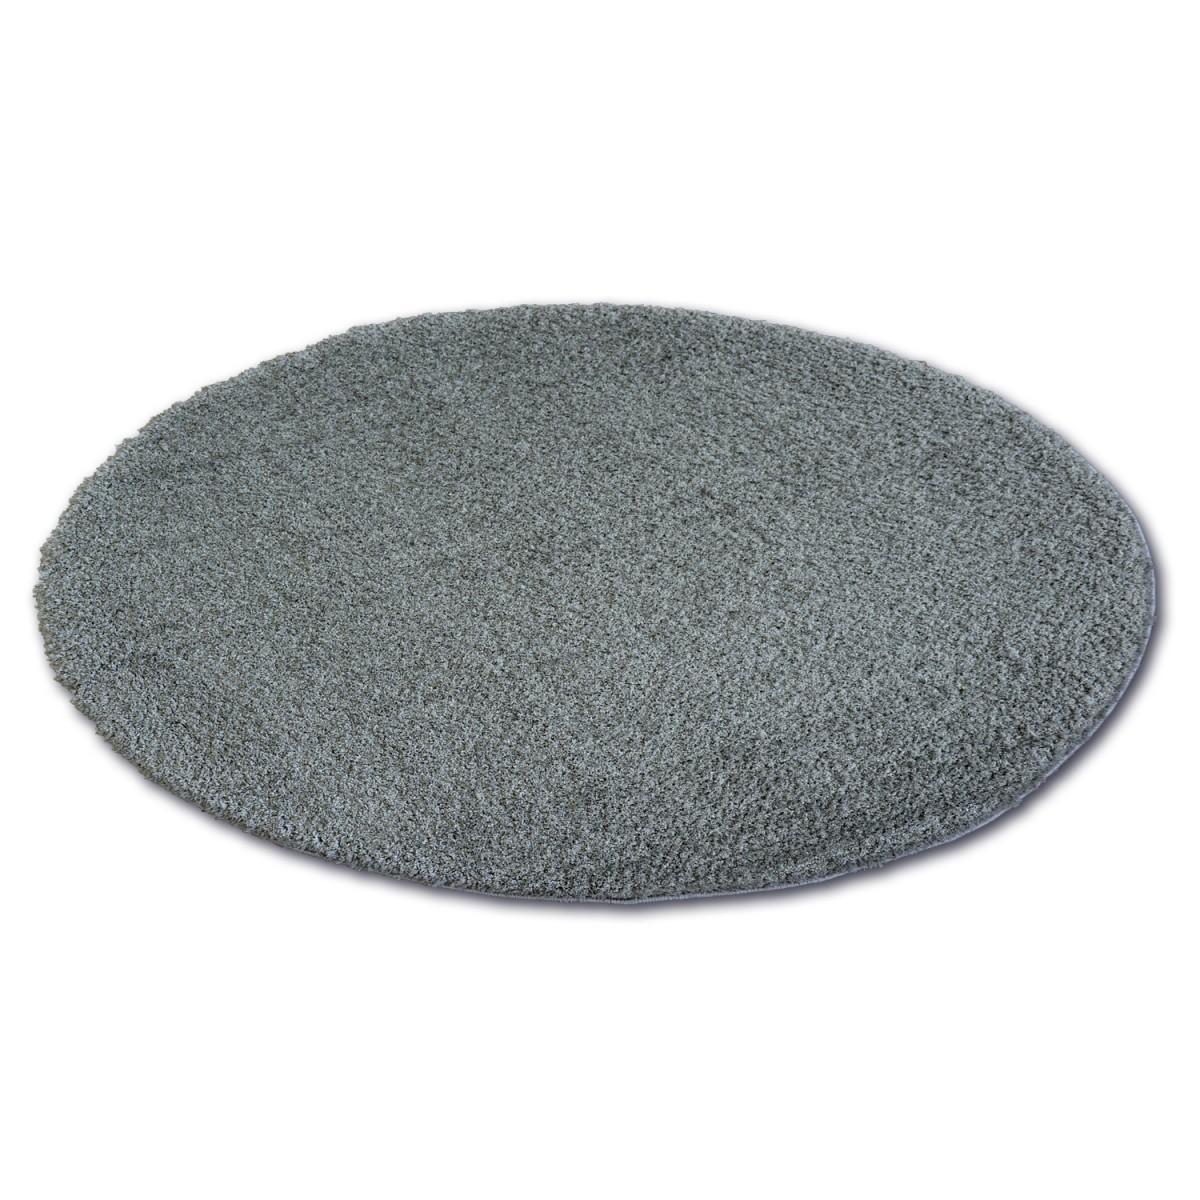 3kraft Kulatý koberec SHAGGY MICRO antracitový